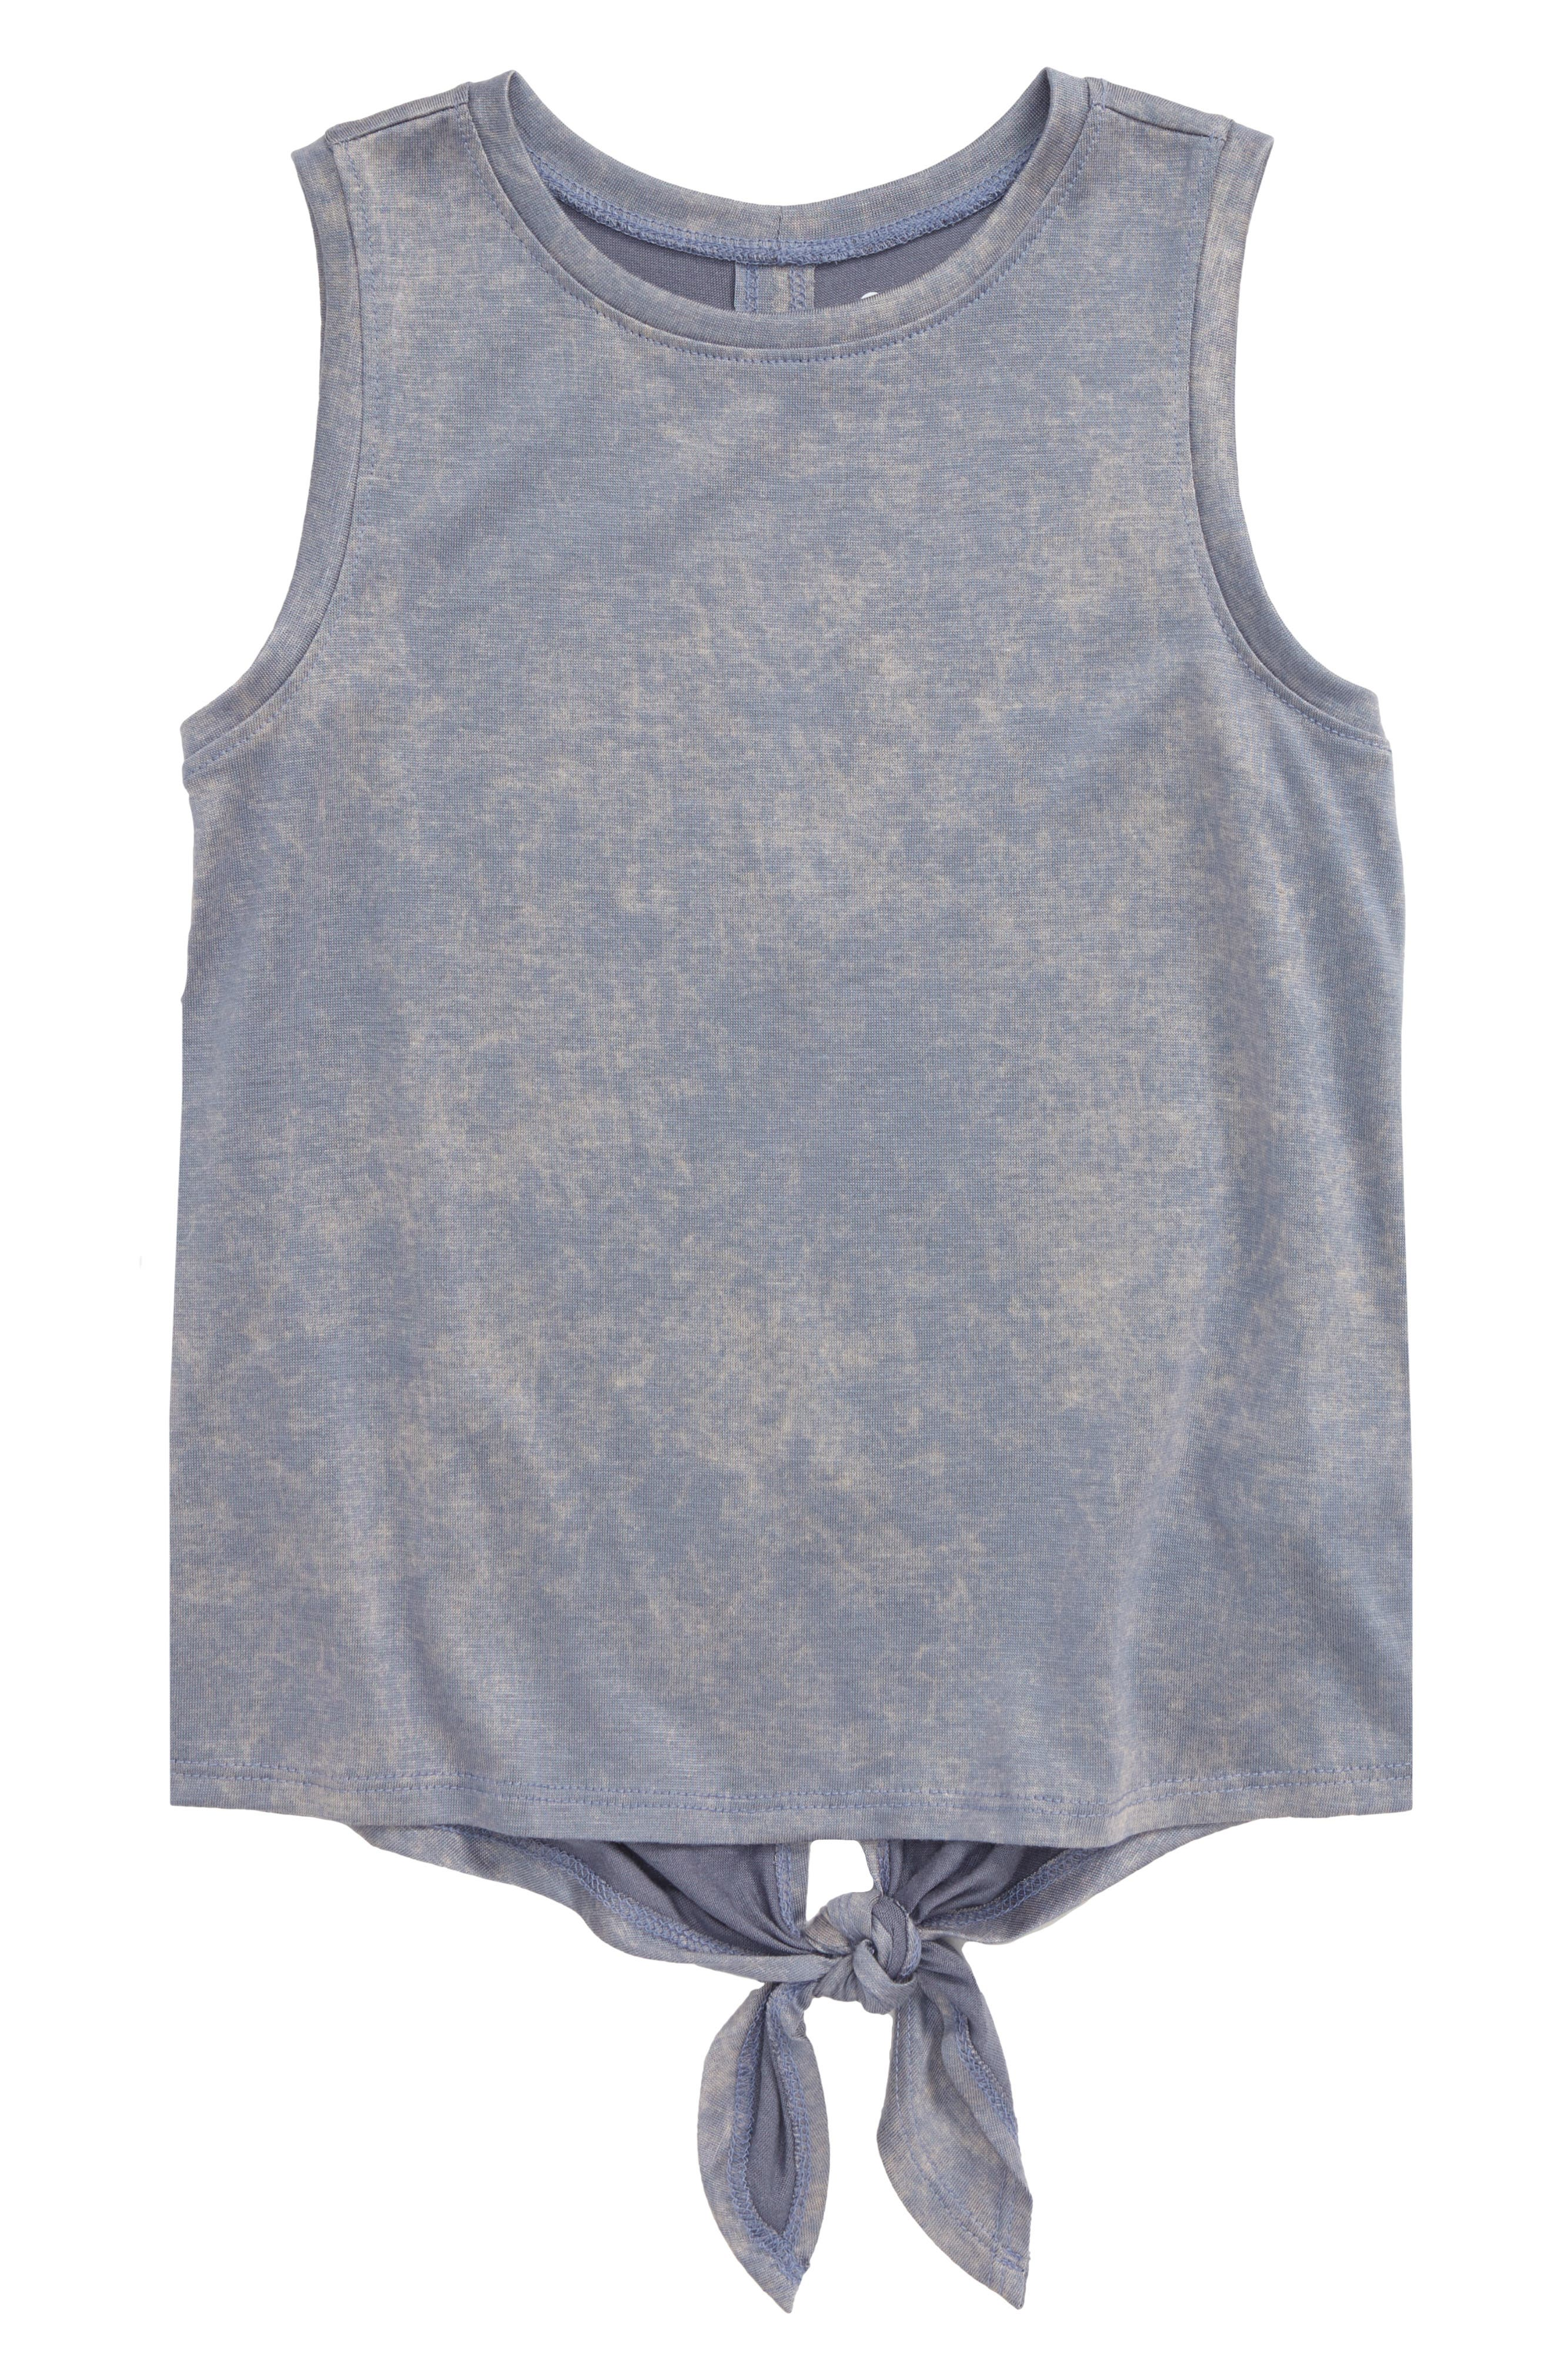 Zella Kids Girls Mesh Back High Low Sleeveless Tank Top Shirt